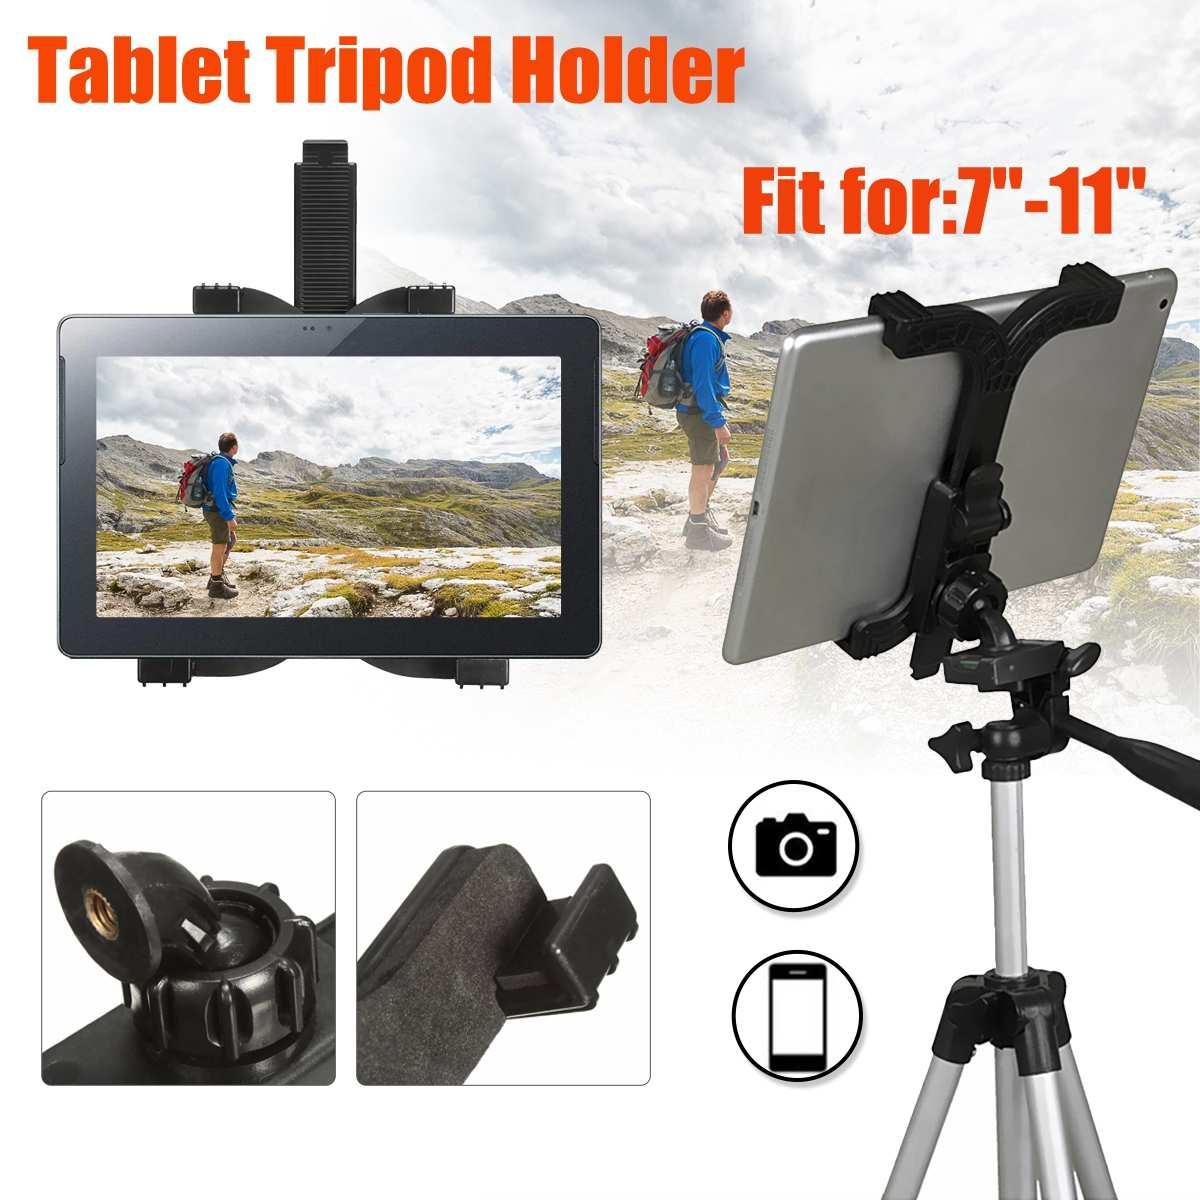 Adjustable ABS Self-Stick Tripod Mount Stand Holder Tablet Mount Holder Bracket Clip Accessories For 7-11'' Tablet For iPad